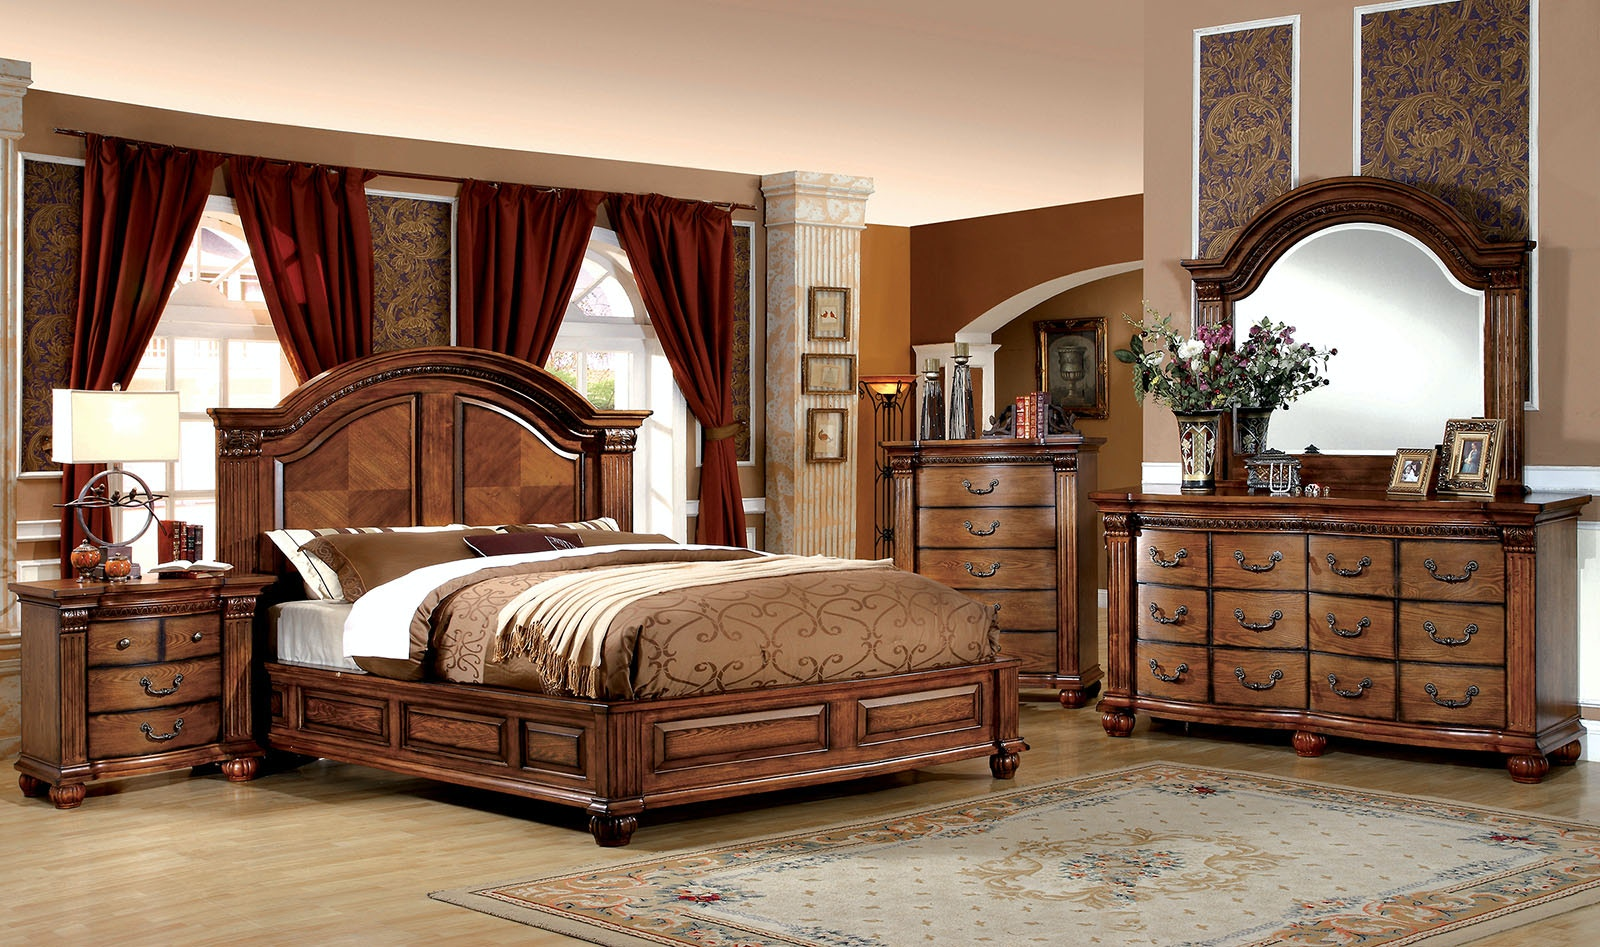 Furniture Of America Cal.King Bed CM7738CK R